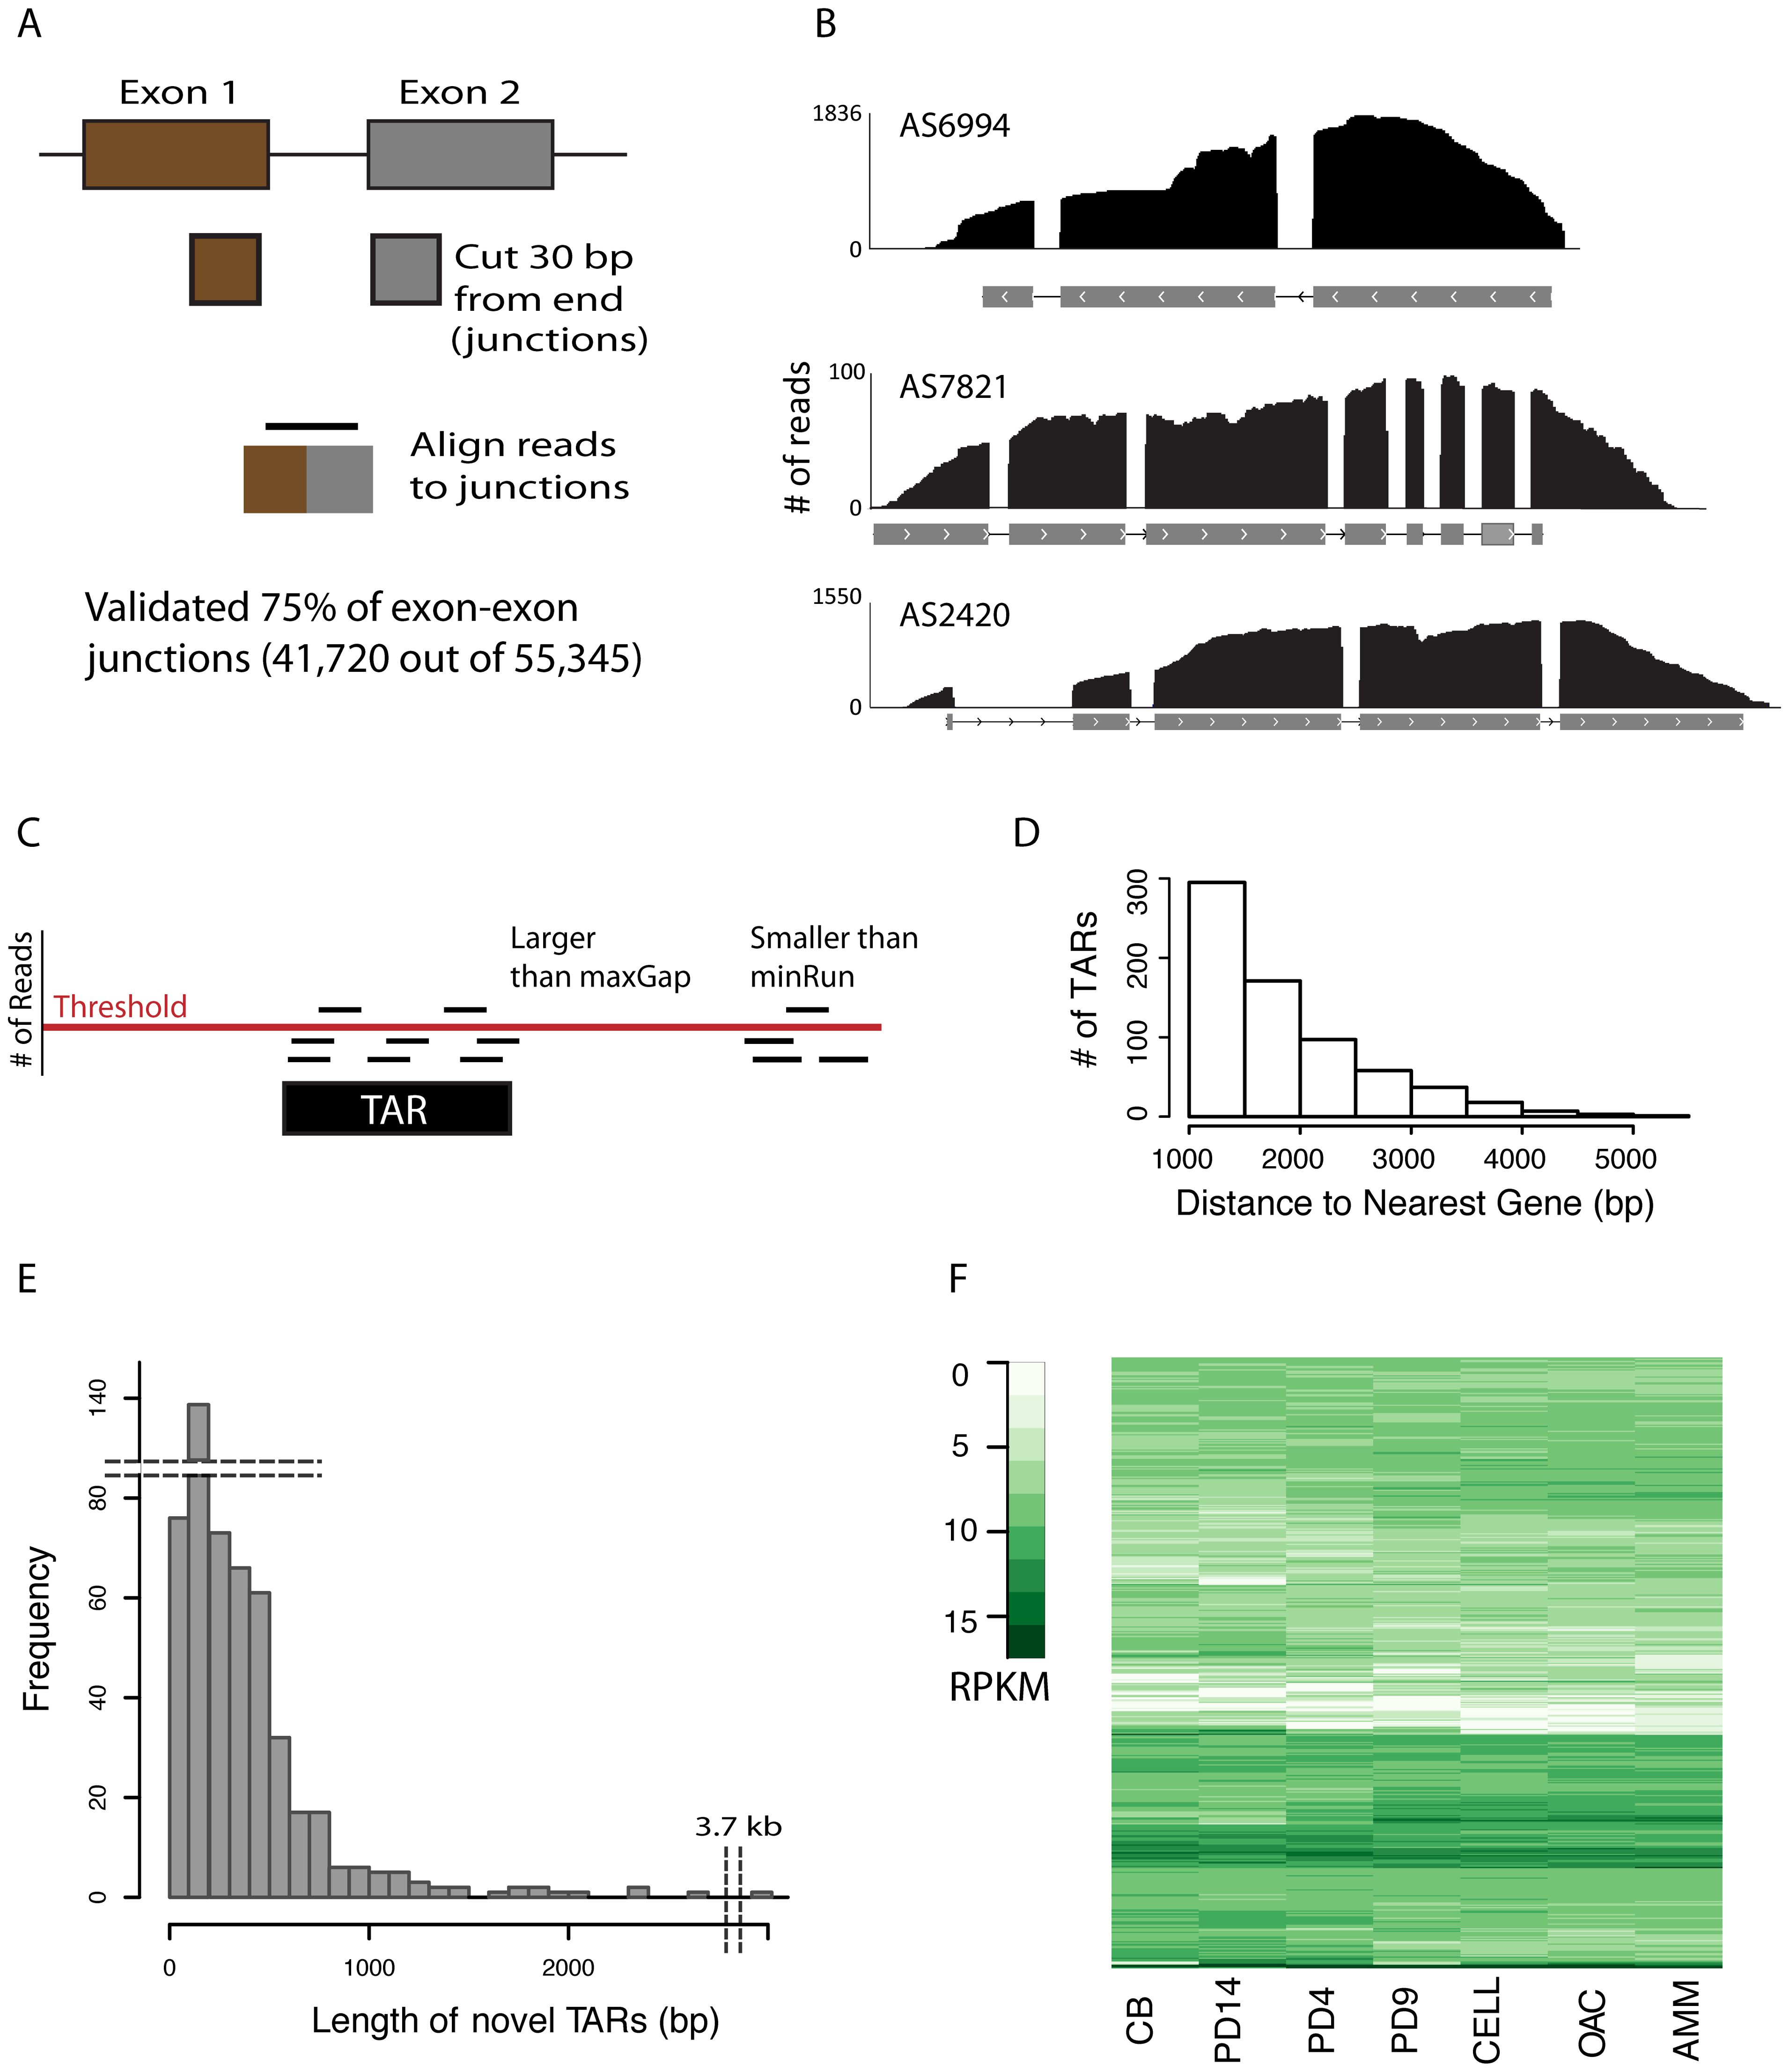 Validating gene models and novel TARs.